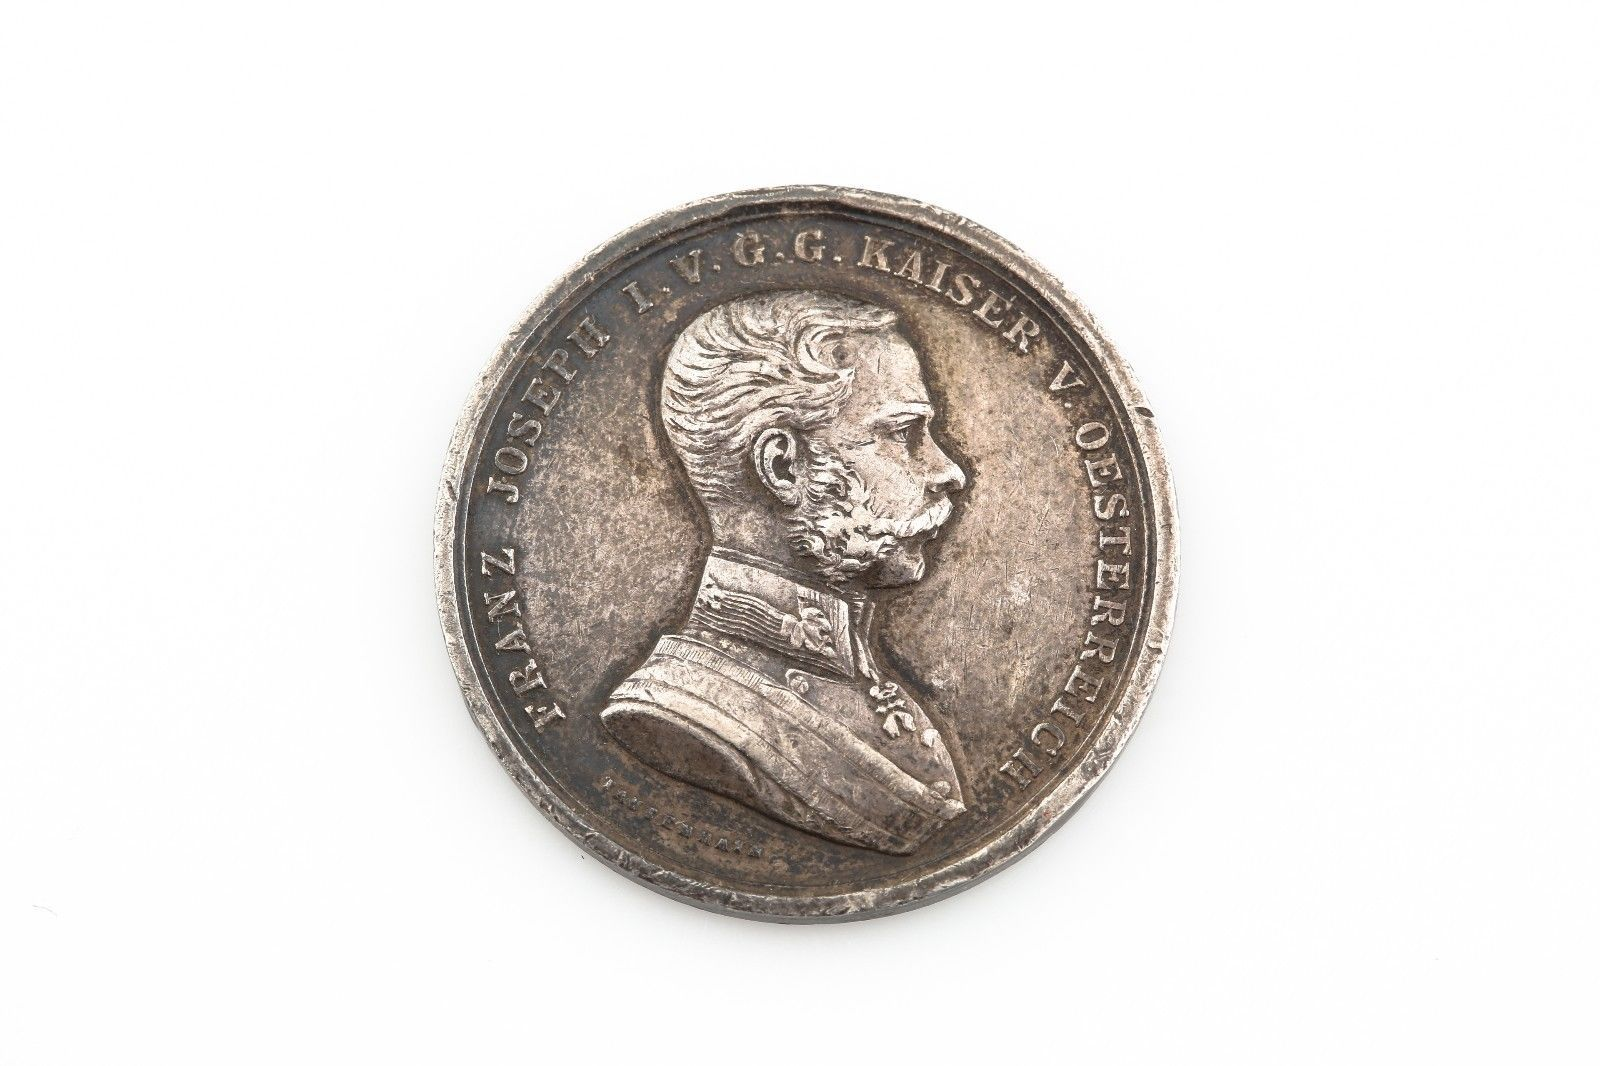 1870-1880 Austria Silver Medal Award for Bravery XF High Relief Der Tapferkeit - $64.35